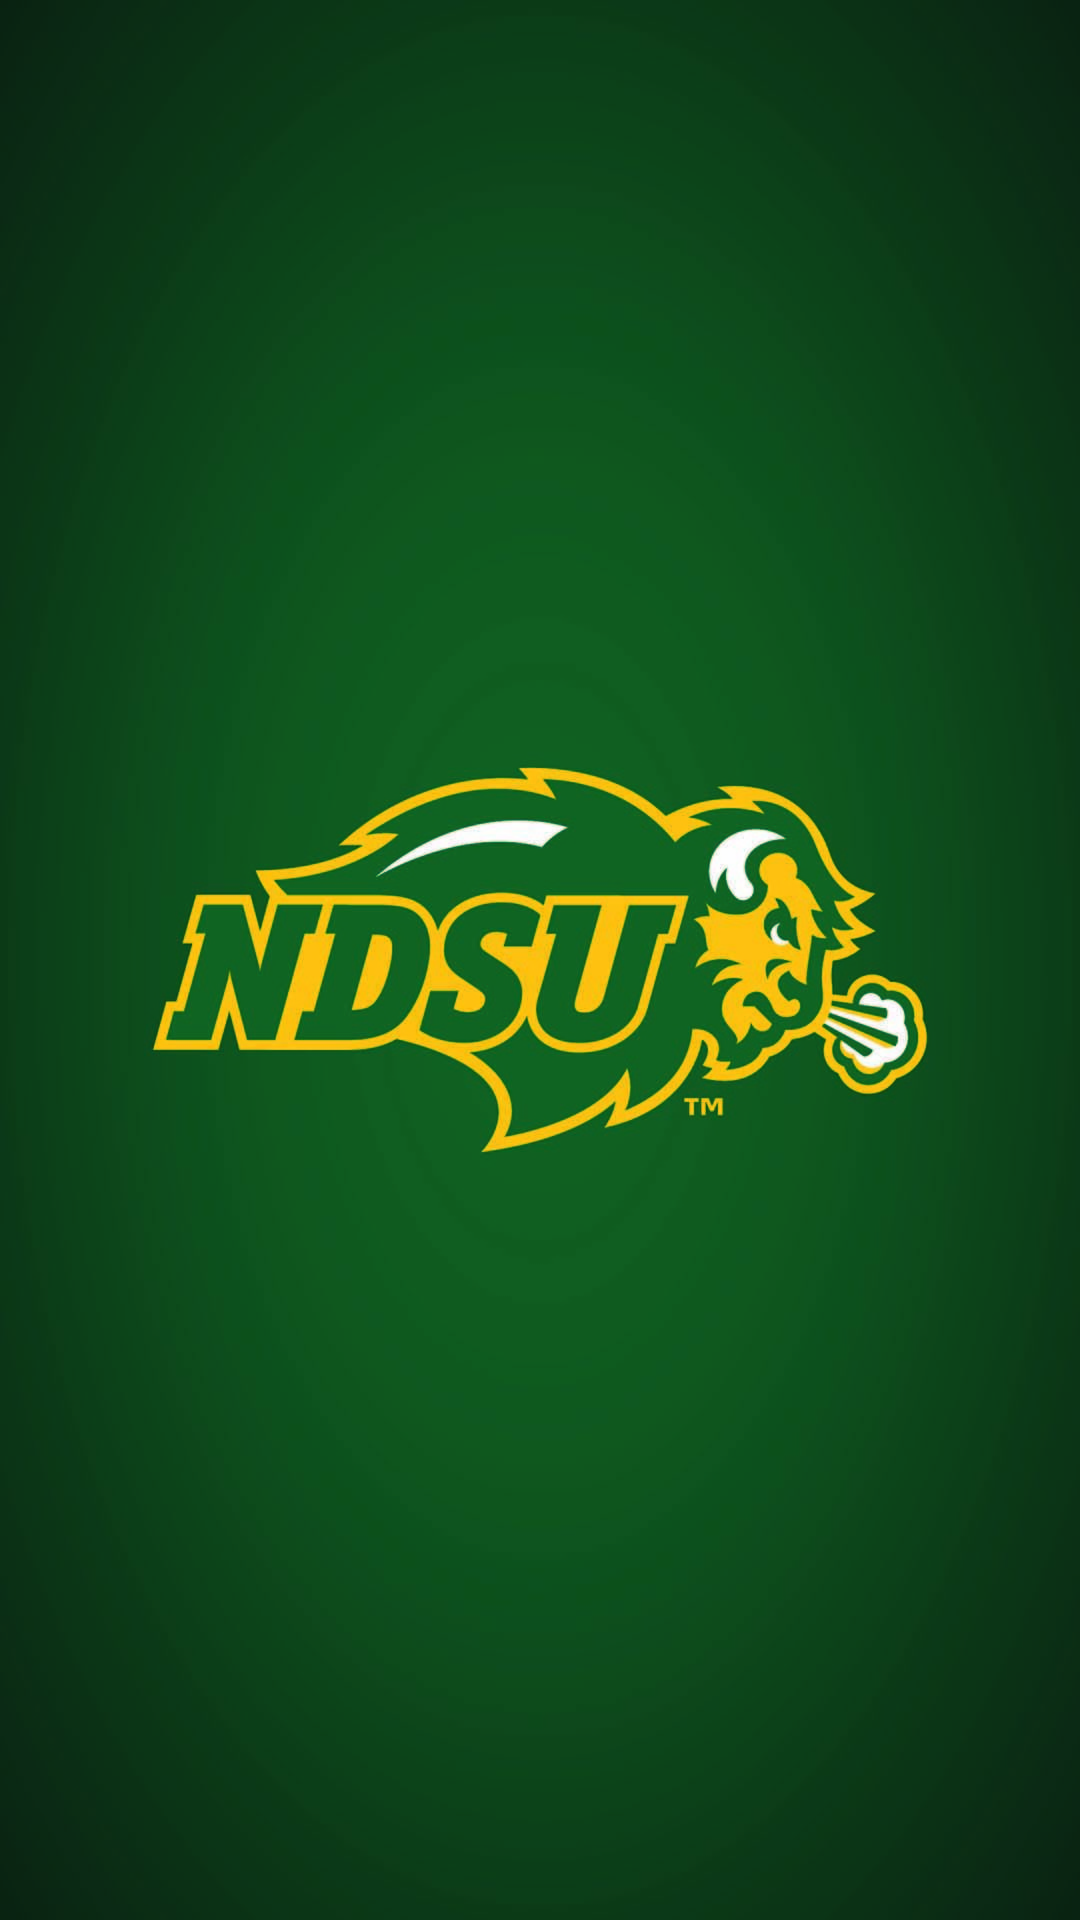 North Dakota State Bison Mobile Wallpaper 4045 1080x1920